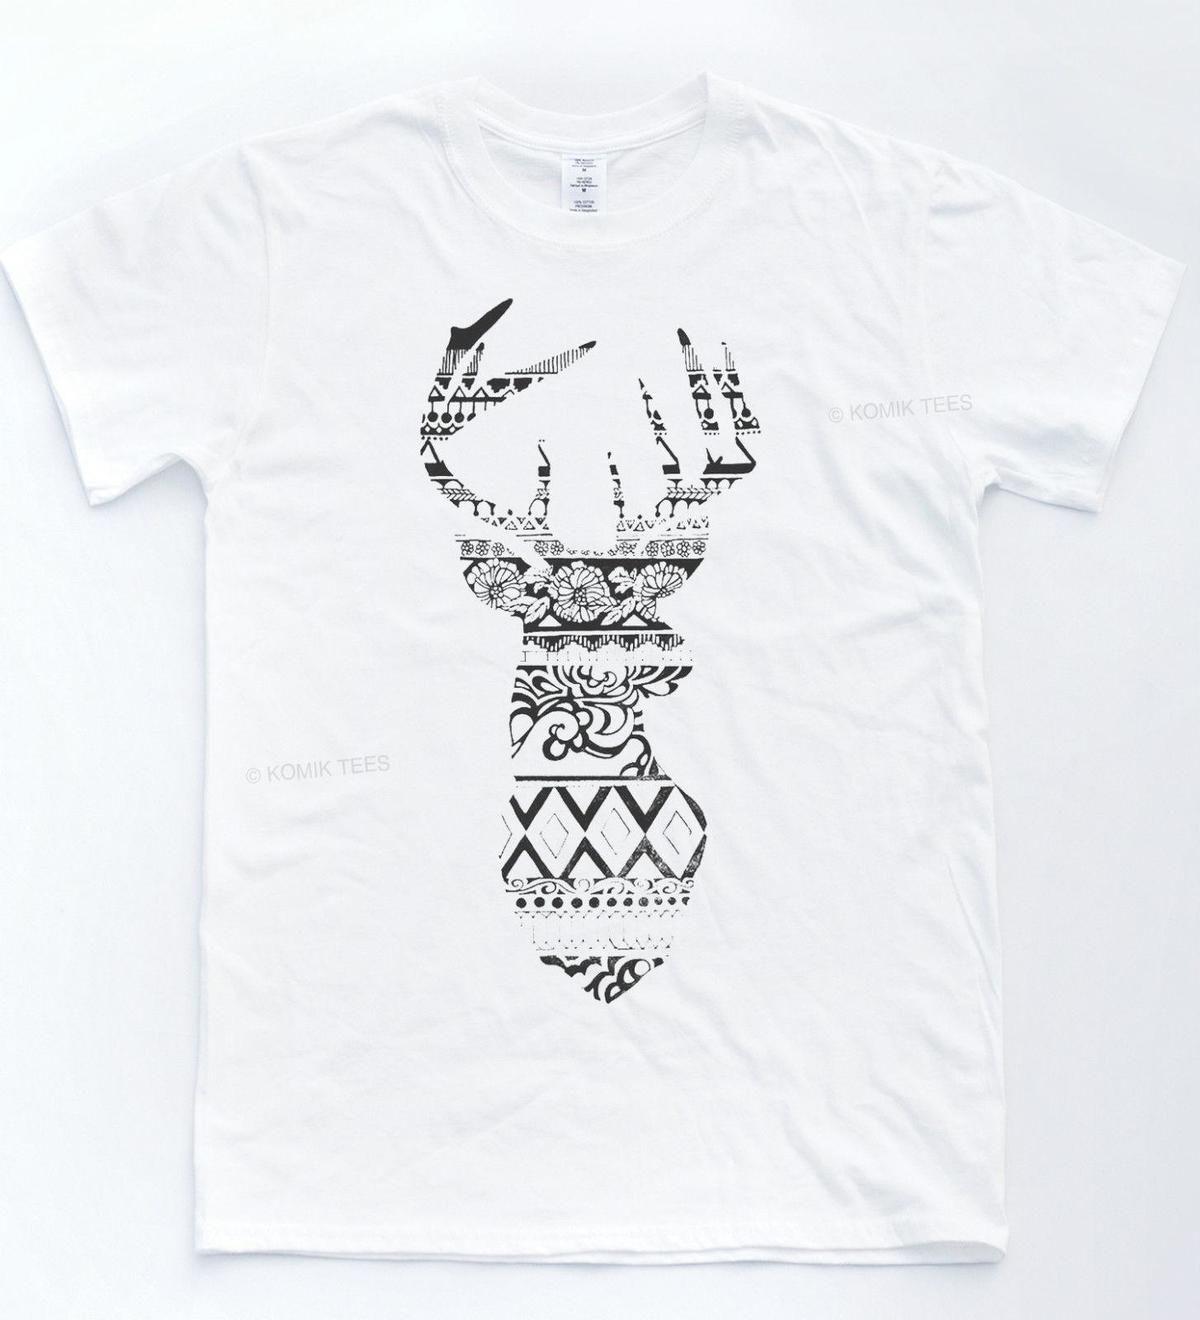 Fairisle Deer T-shirt Christmas Stag Animal Winter Tee Indie Hipster Xmas Top top free shipping t-shirt